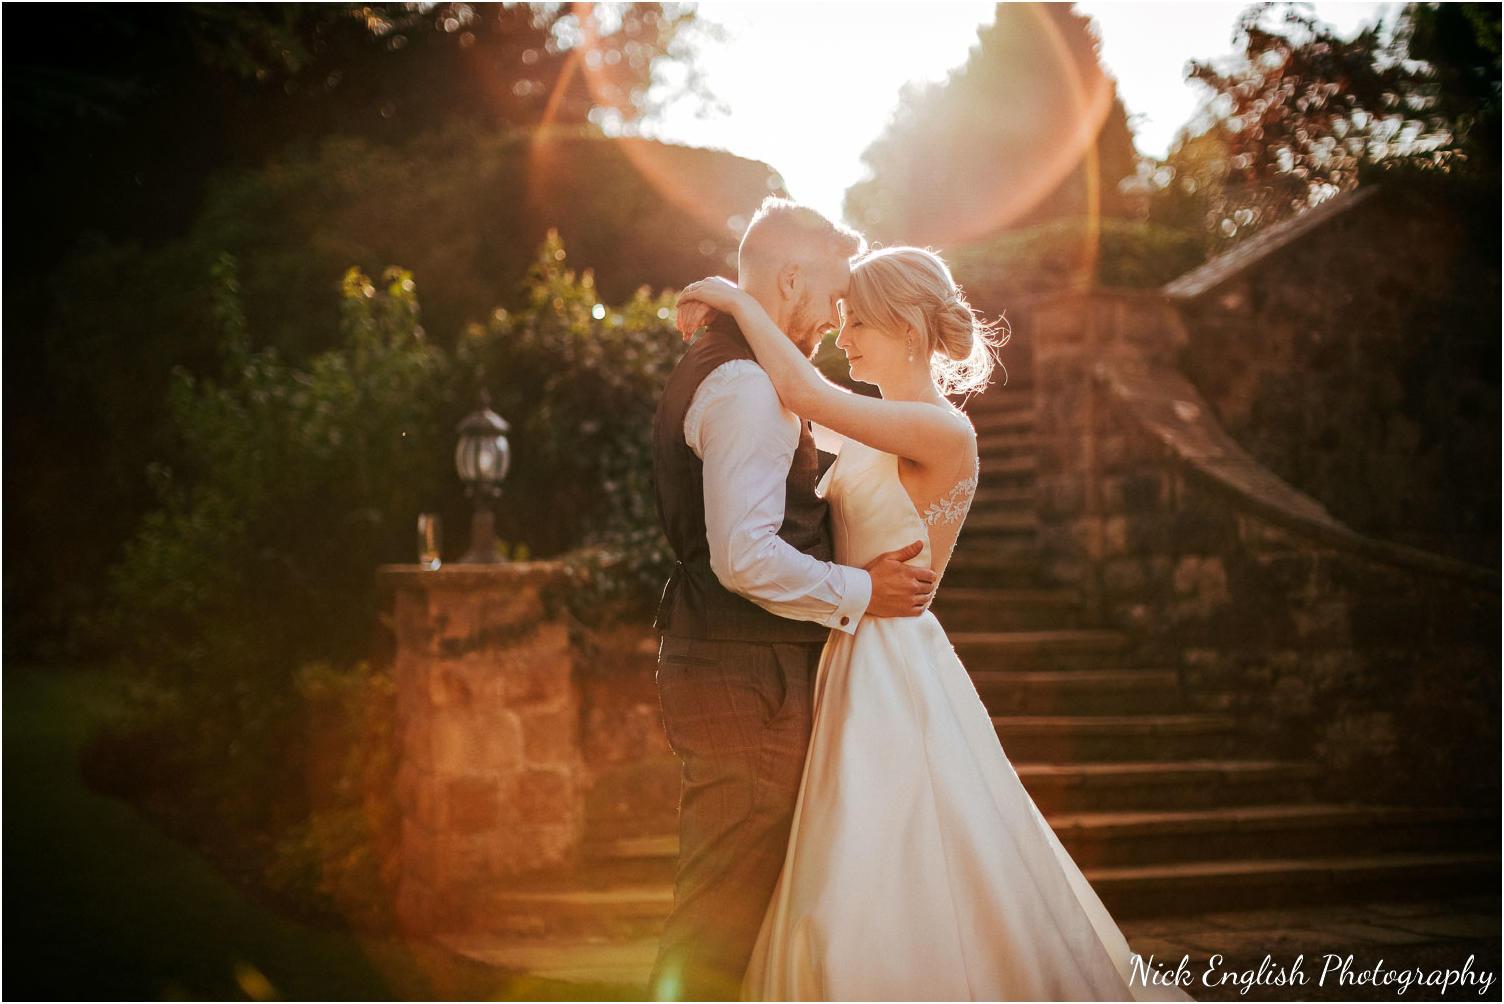 Eaves_Hall_Outdoor_Wedding_Photograph-81.jpg